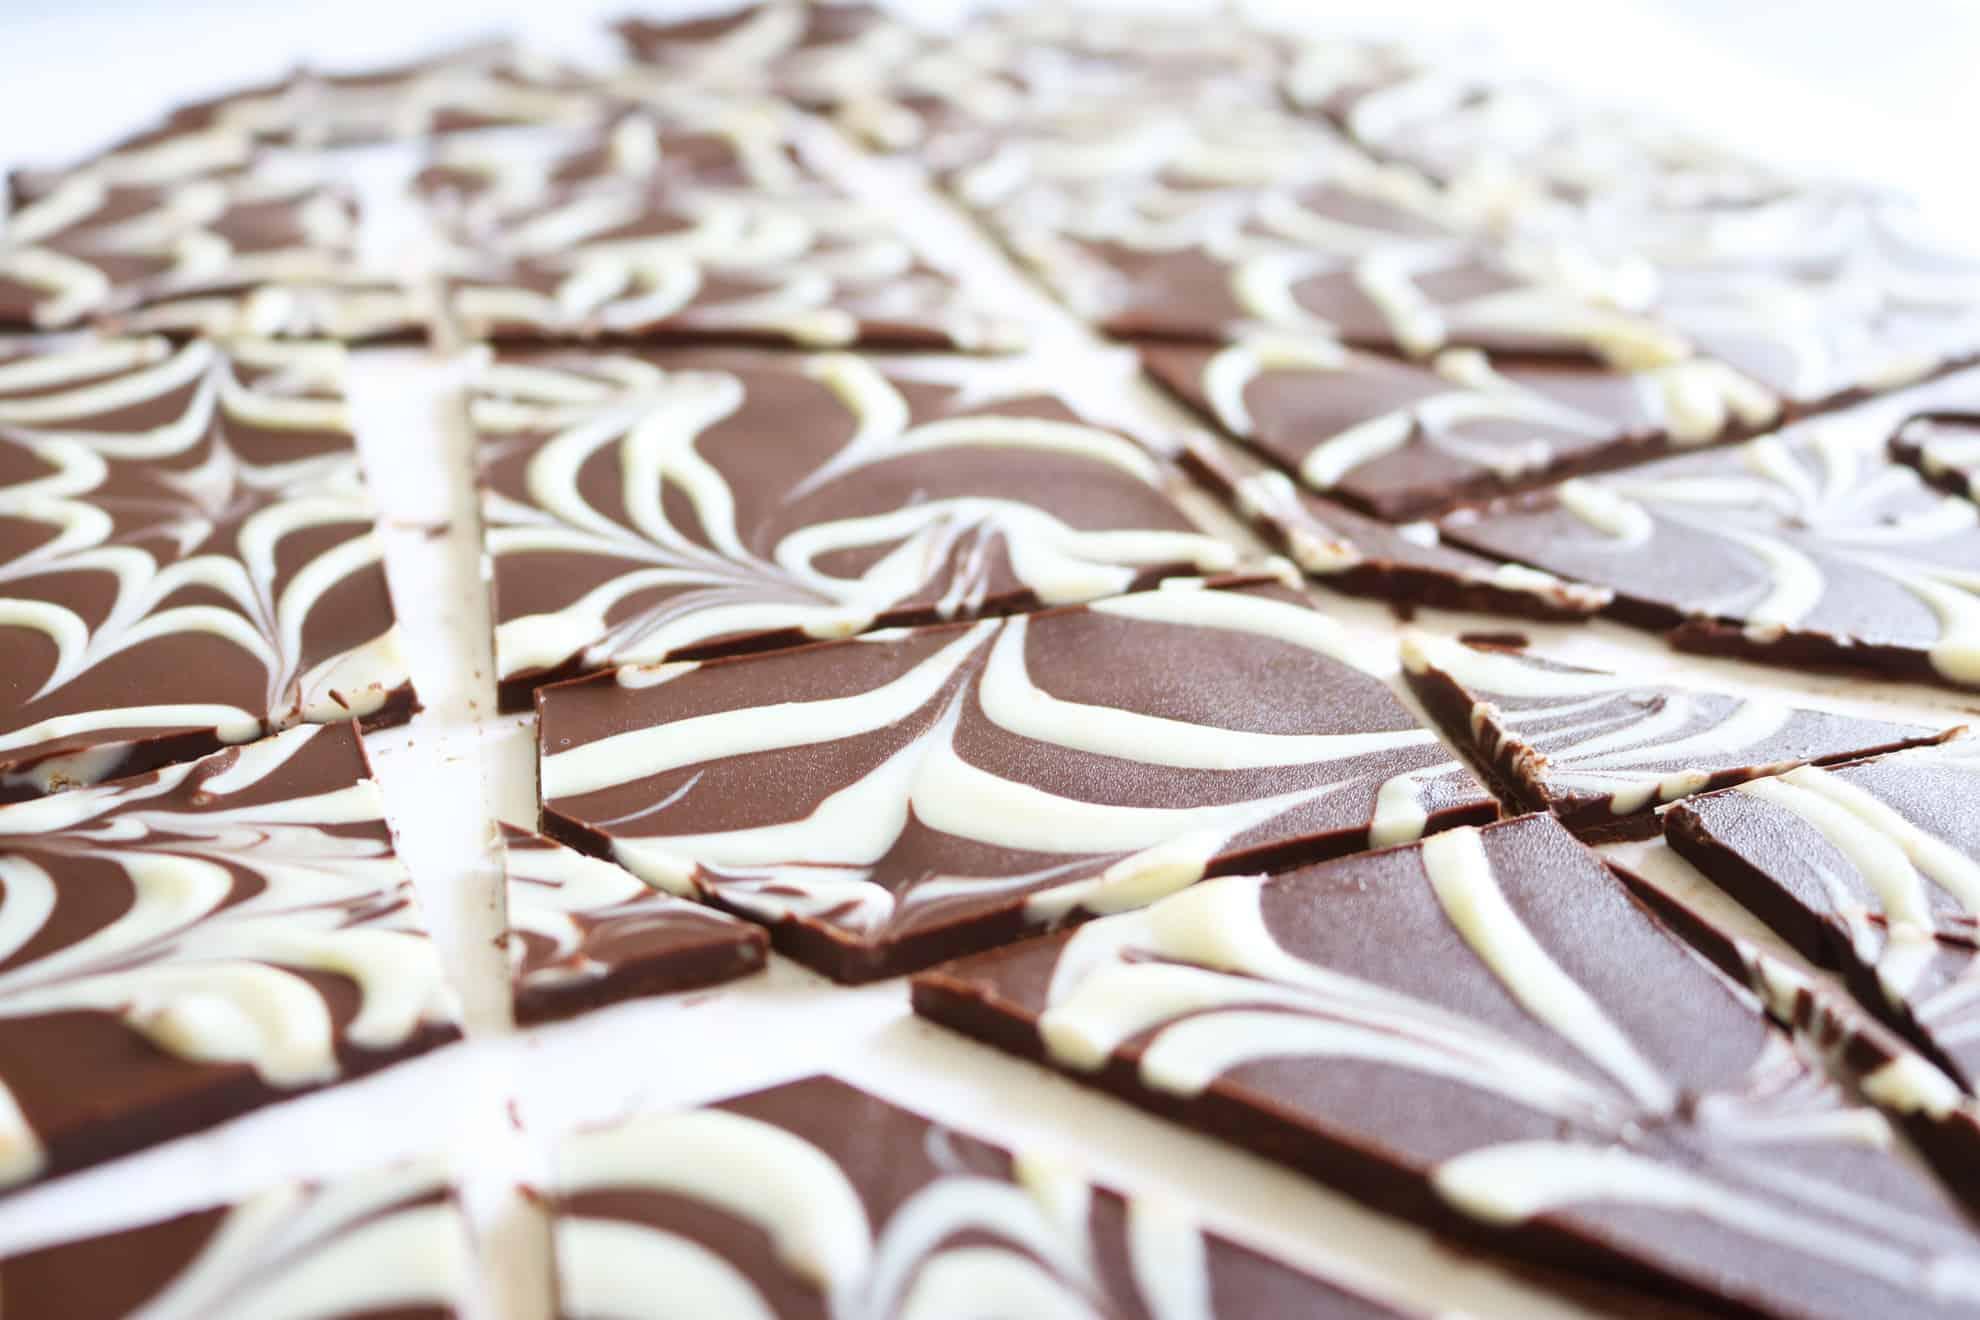 Chocolate Spiderweb Bark